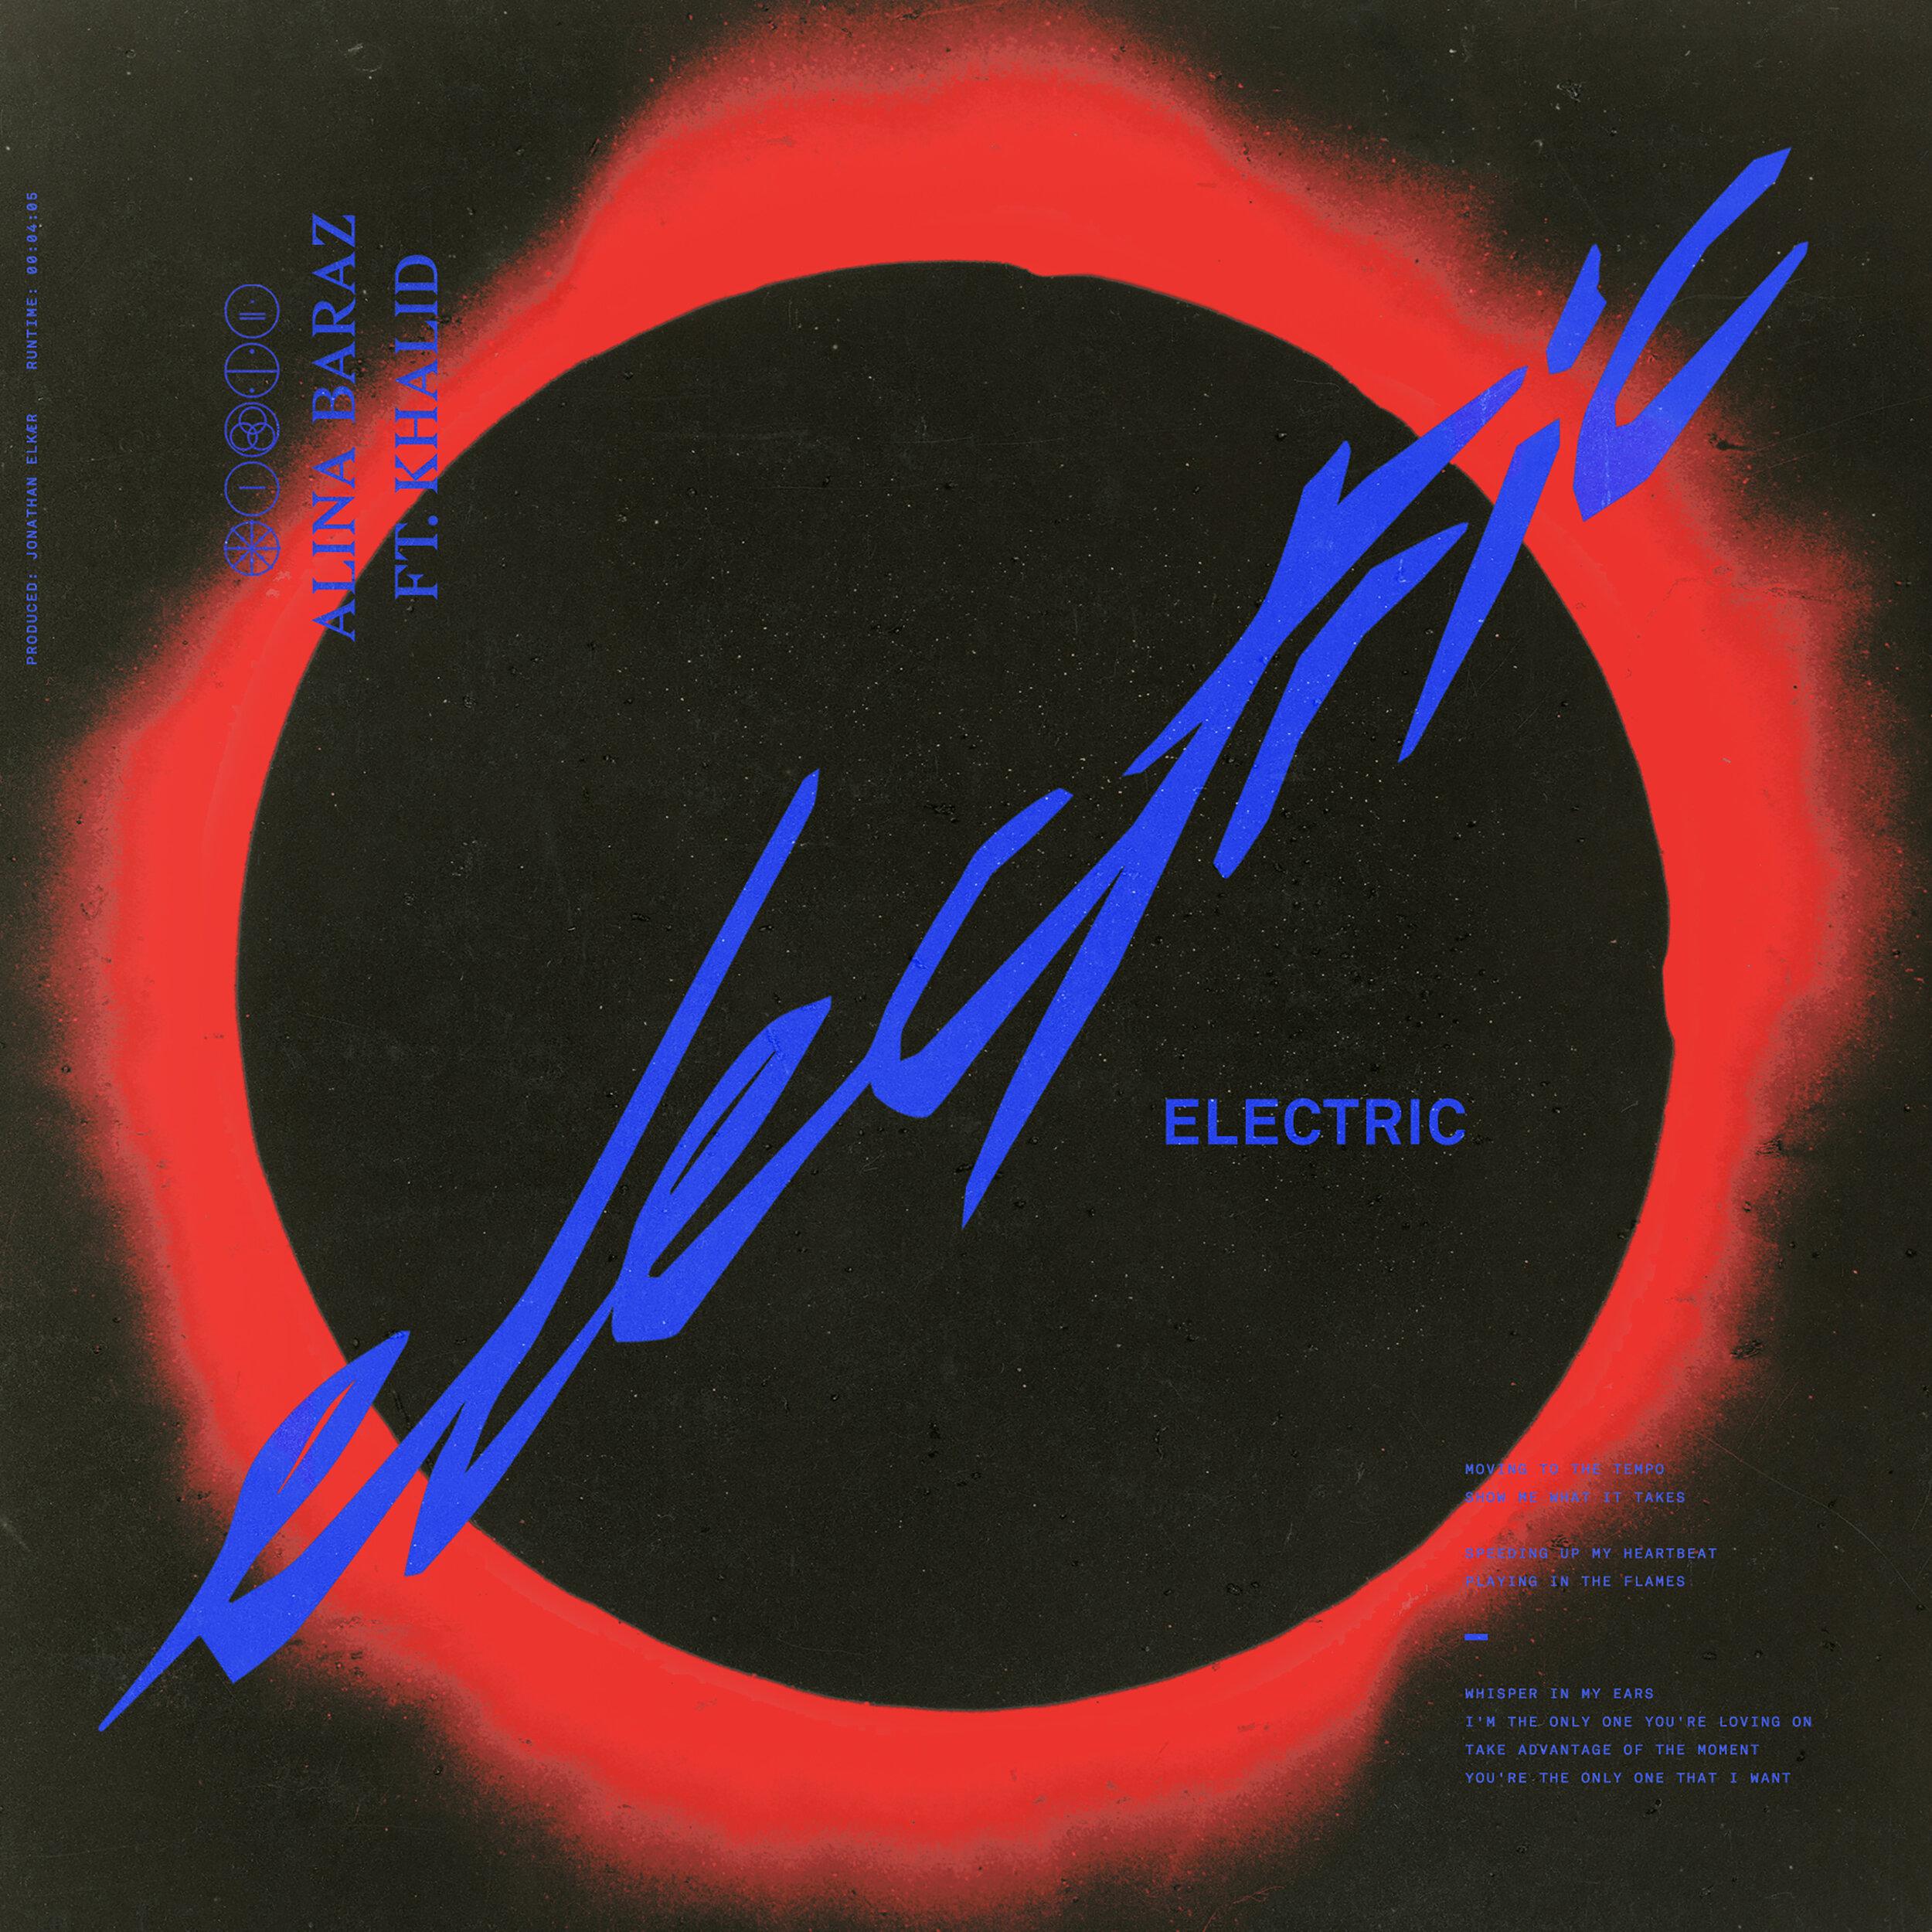 Electric Single Art-3000.jpg